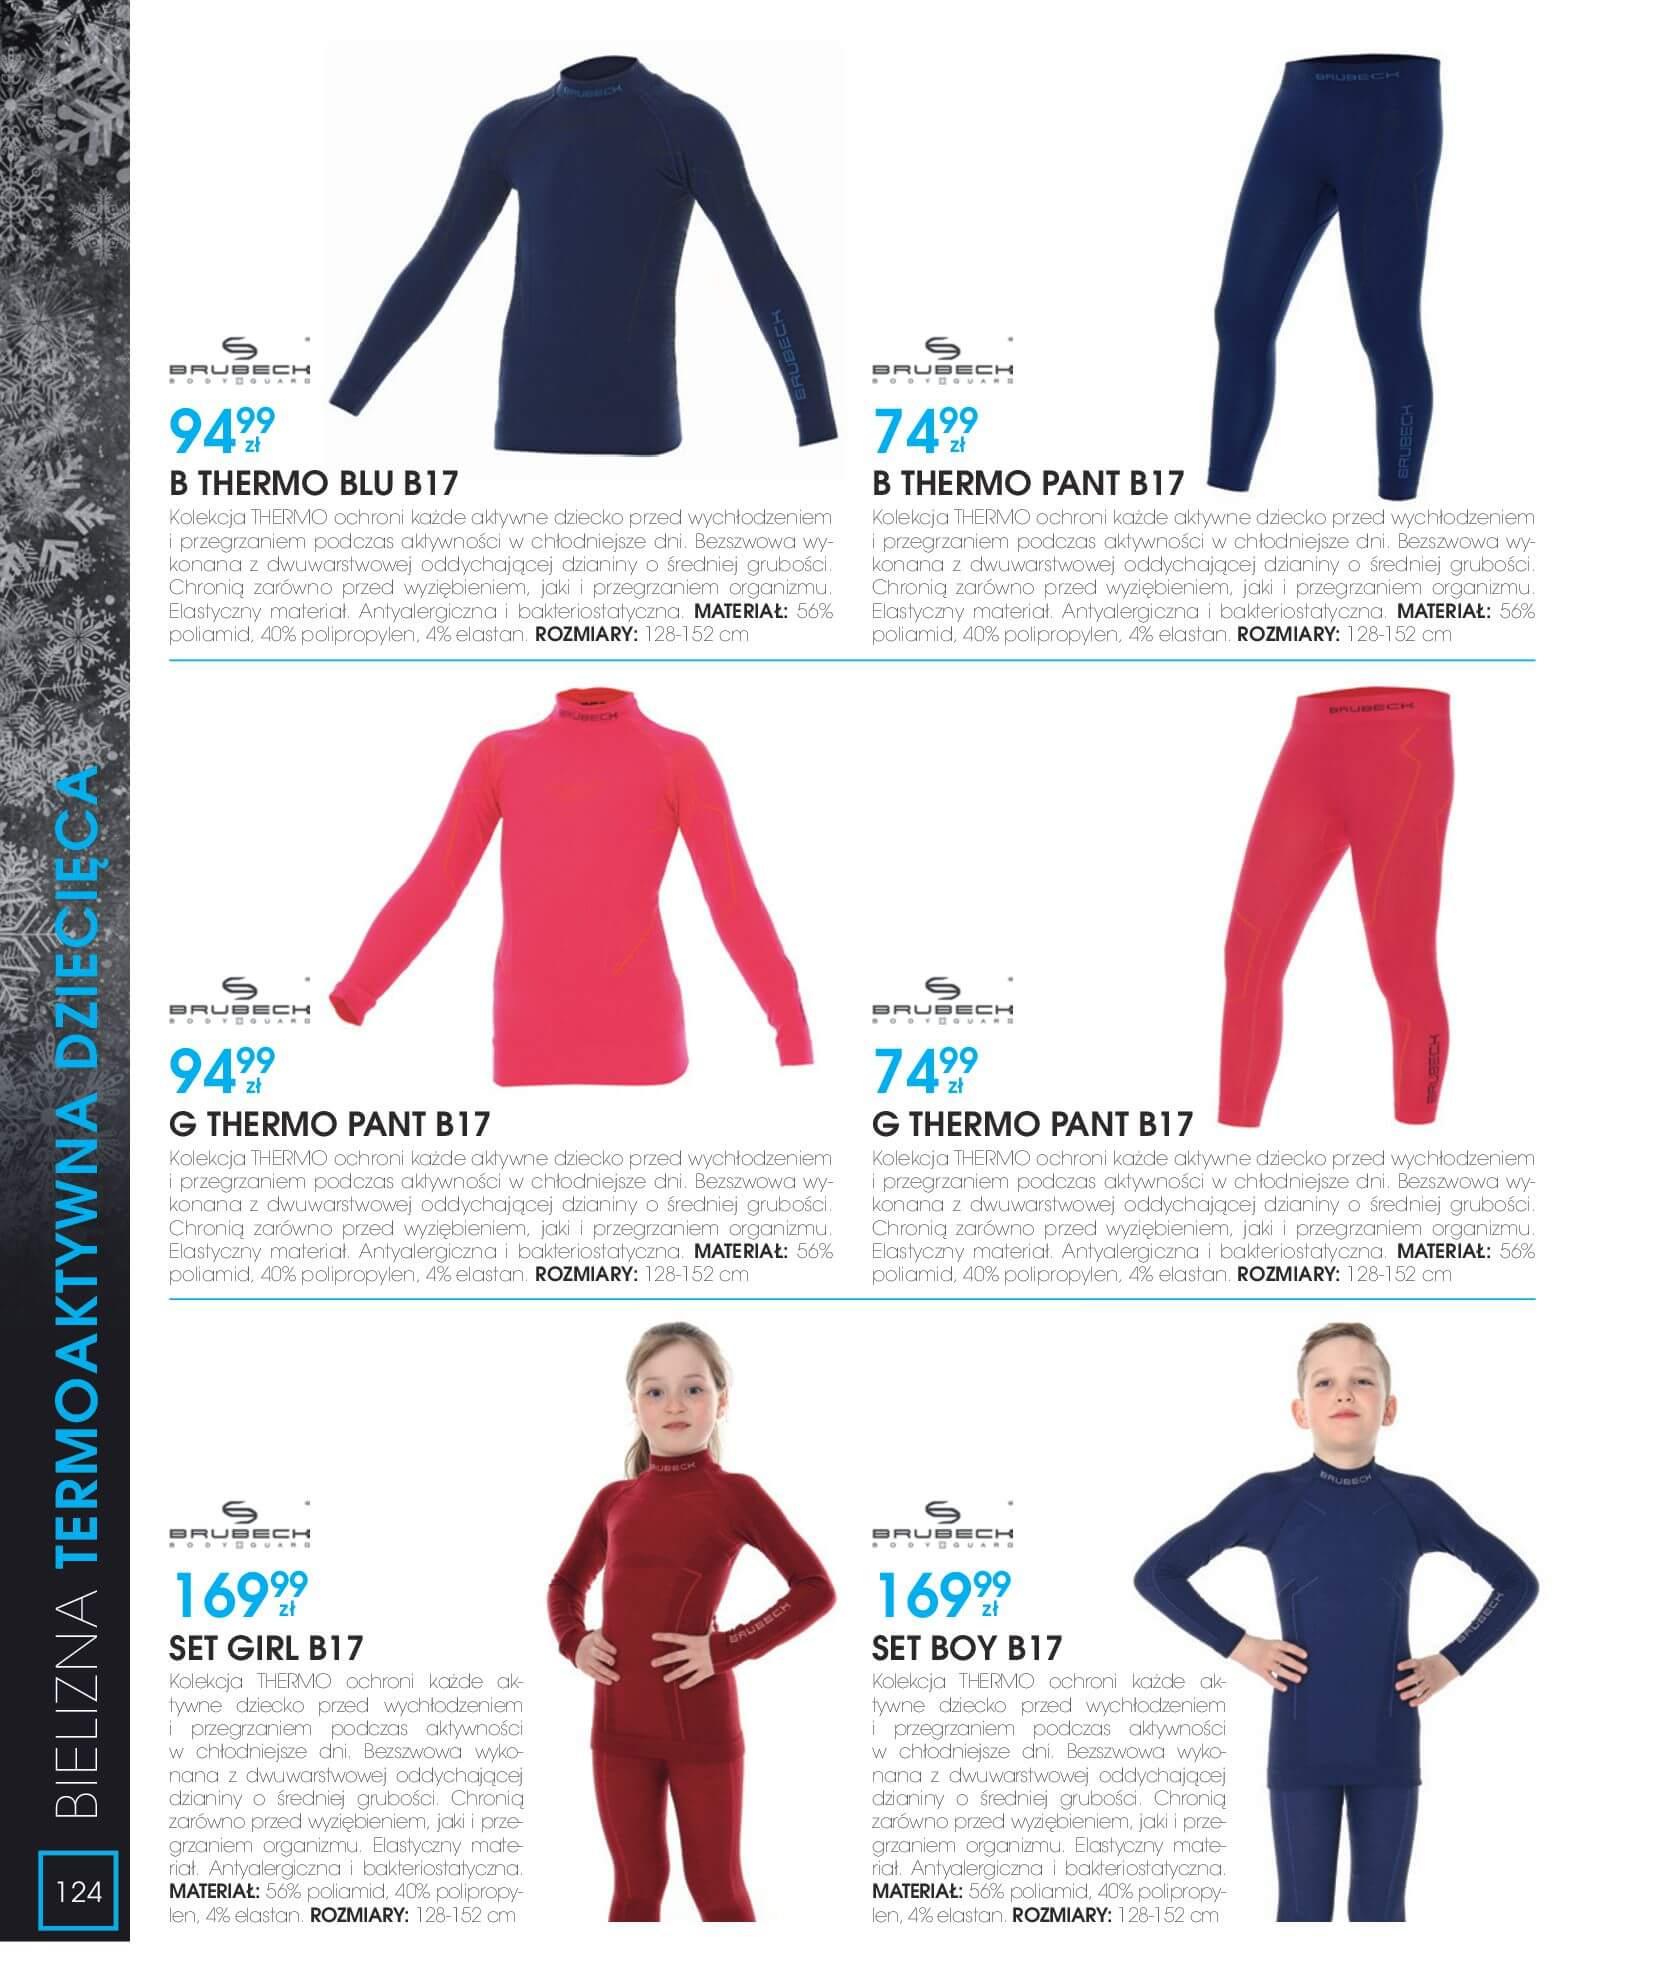 Gazetka Go Sport - Katalog Zima 2017/2018-12.11.2017-28.02.2018-page-124